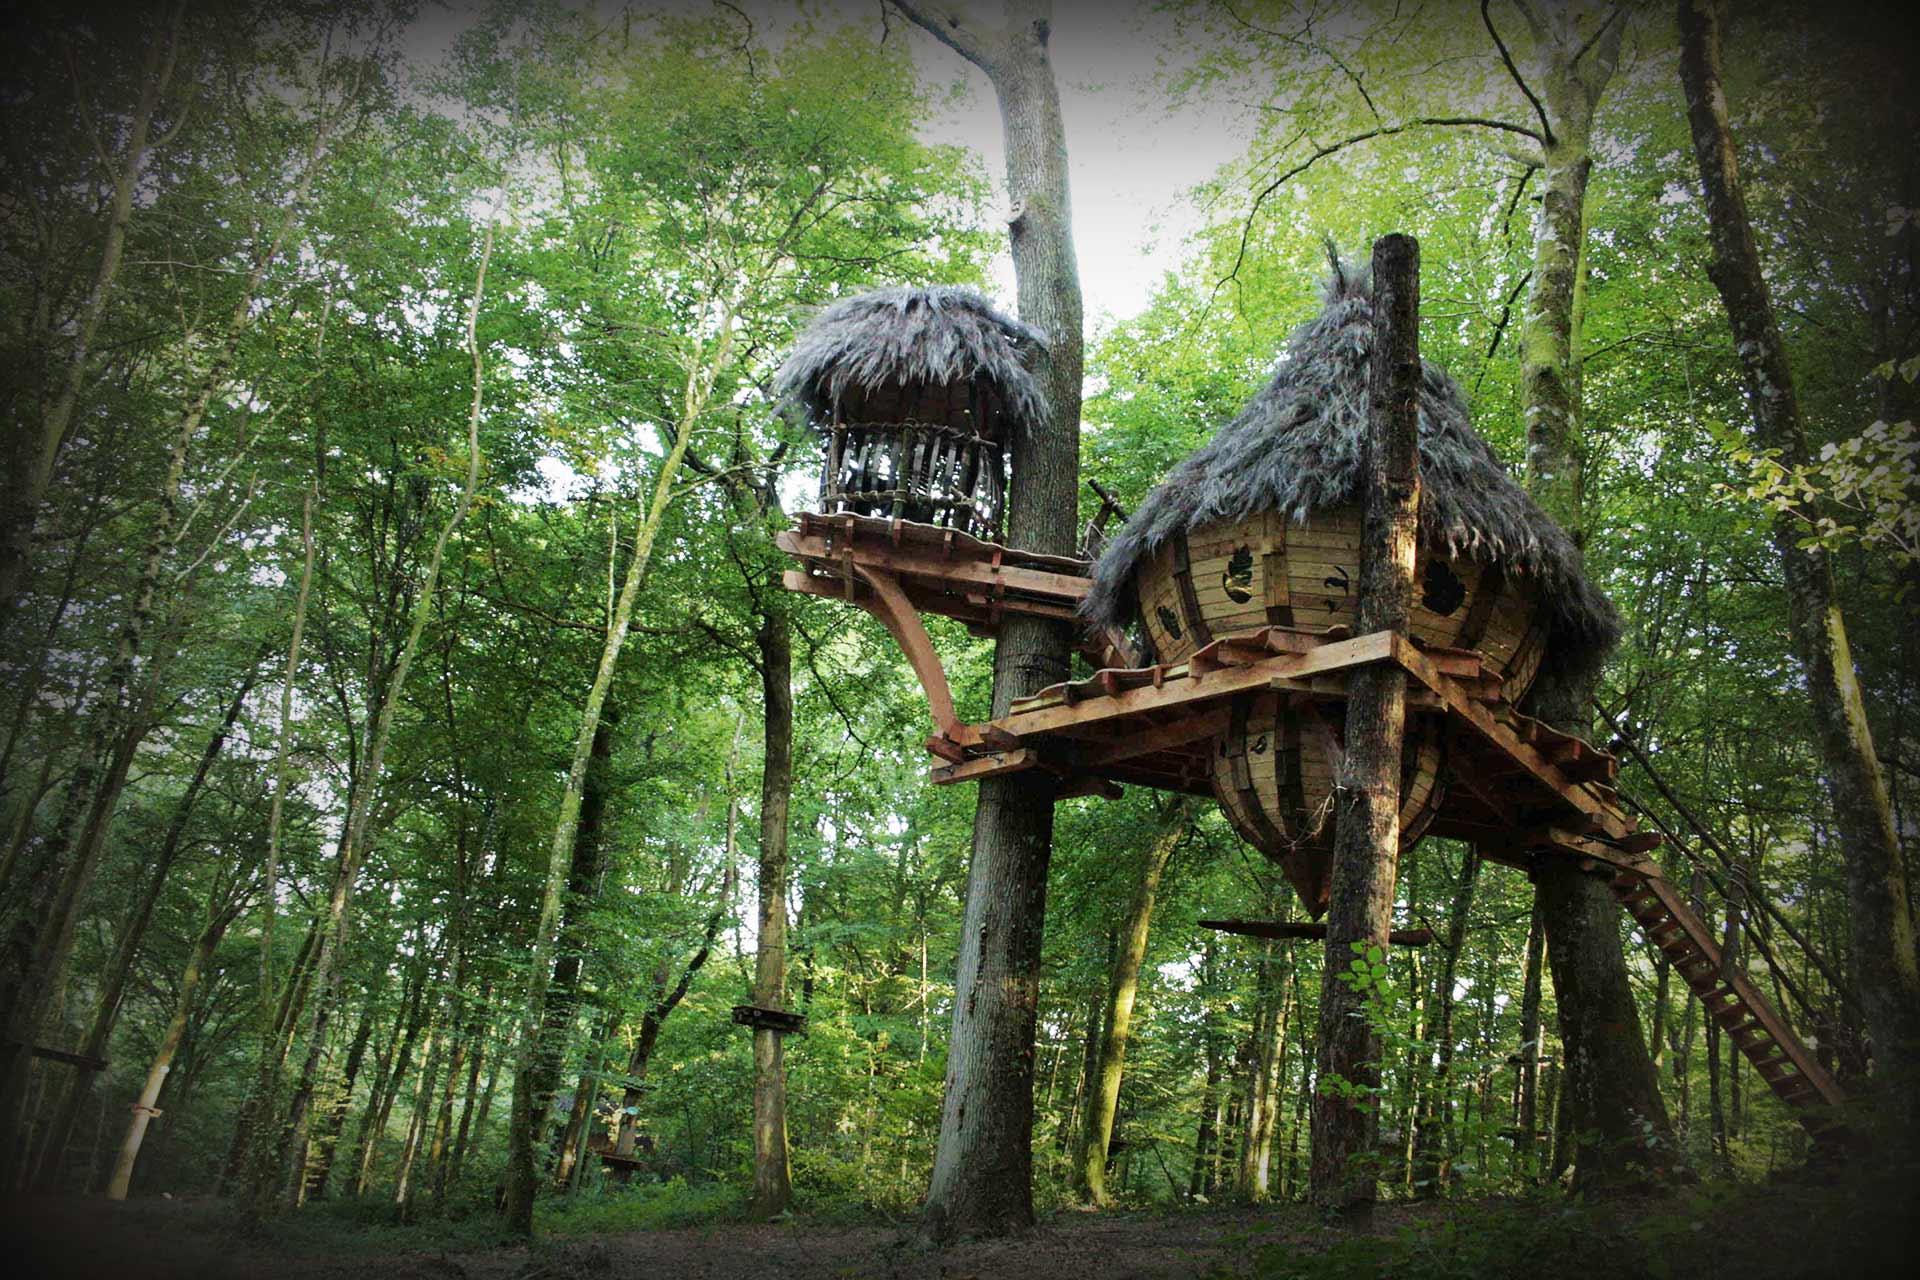 abane cabane drommen l 39 arbre cabane en haute marne construction abane. Black Bedroom Furniture Sets. Home Design Ideas